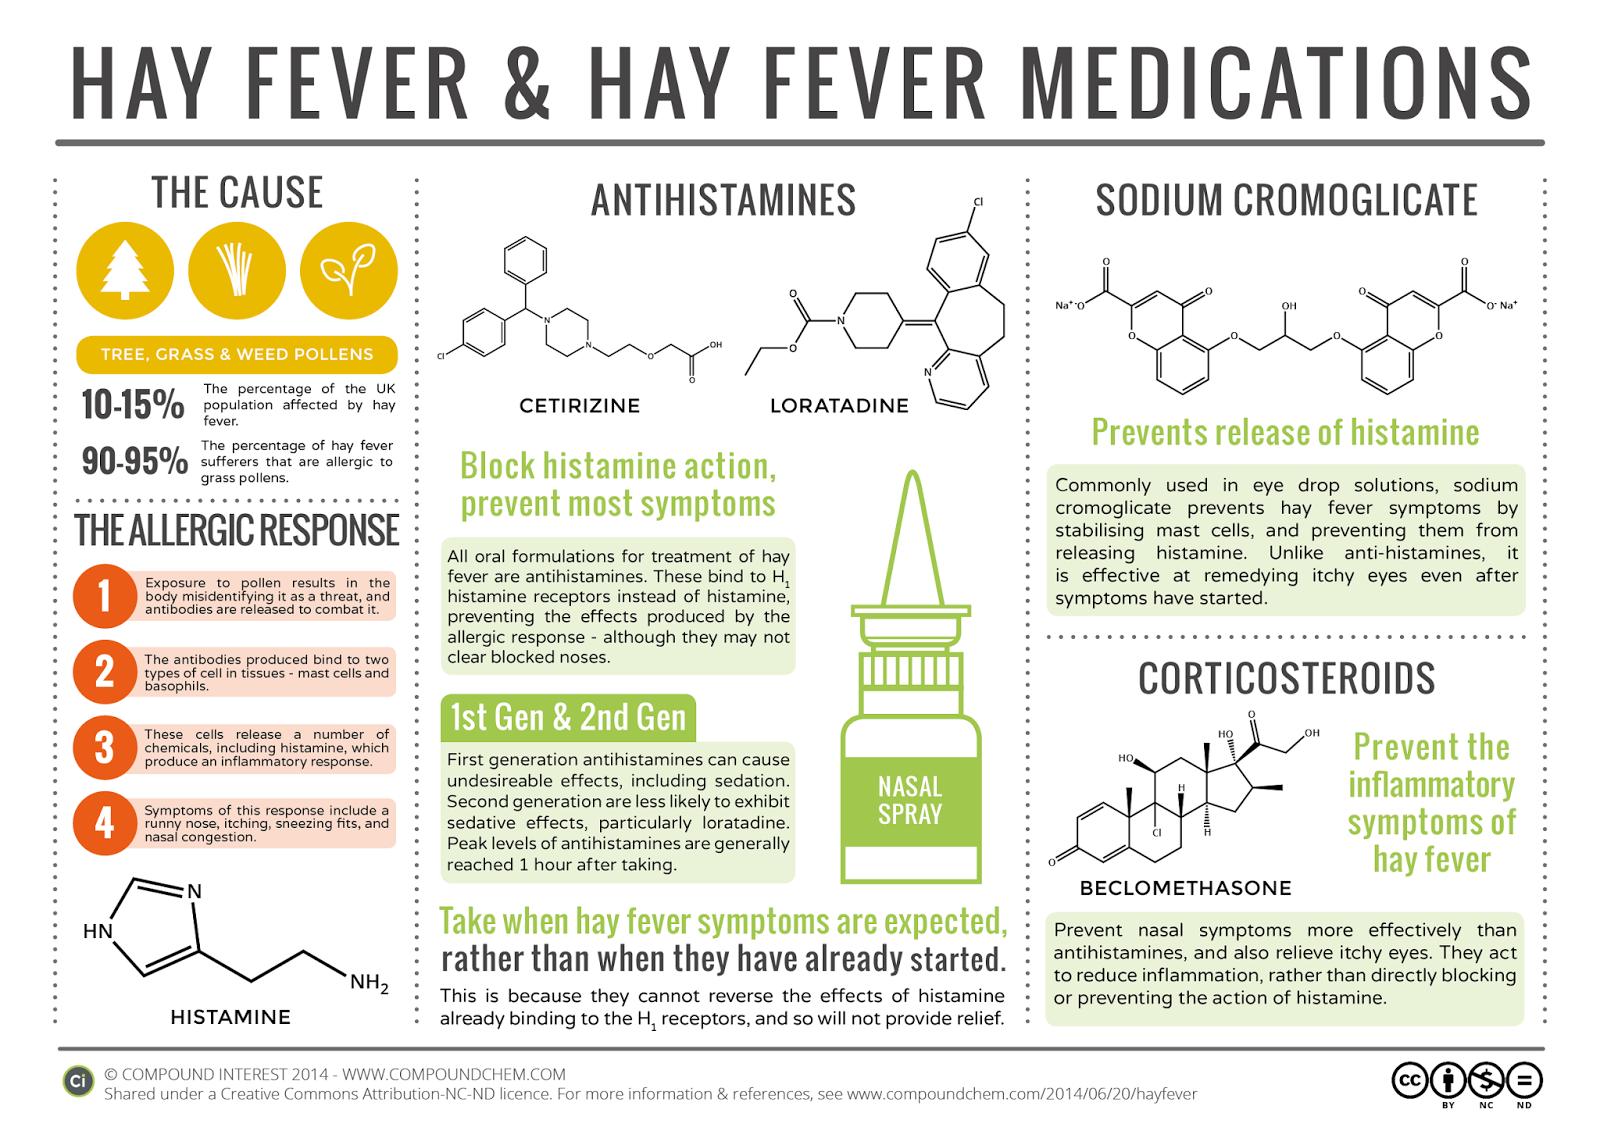 http://www.compoundchem.com/wp-content/uploads/2014/06/Chemistry-Hayfever-Hayfever-Medications.png